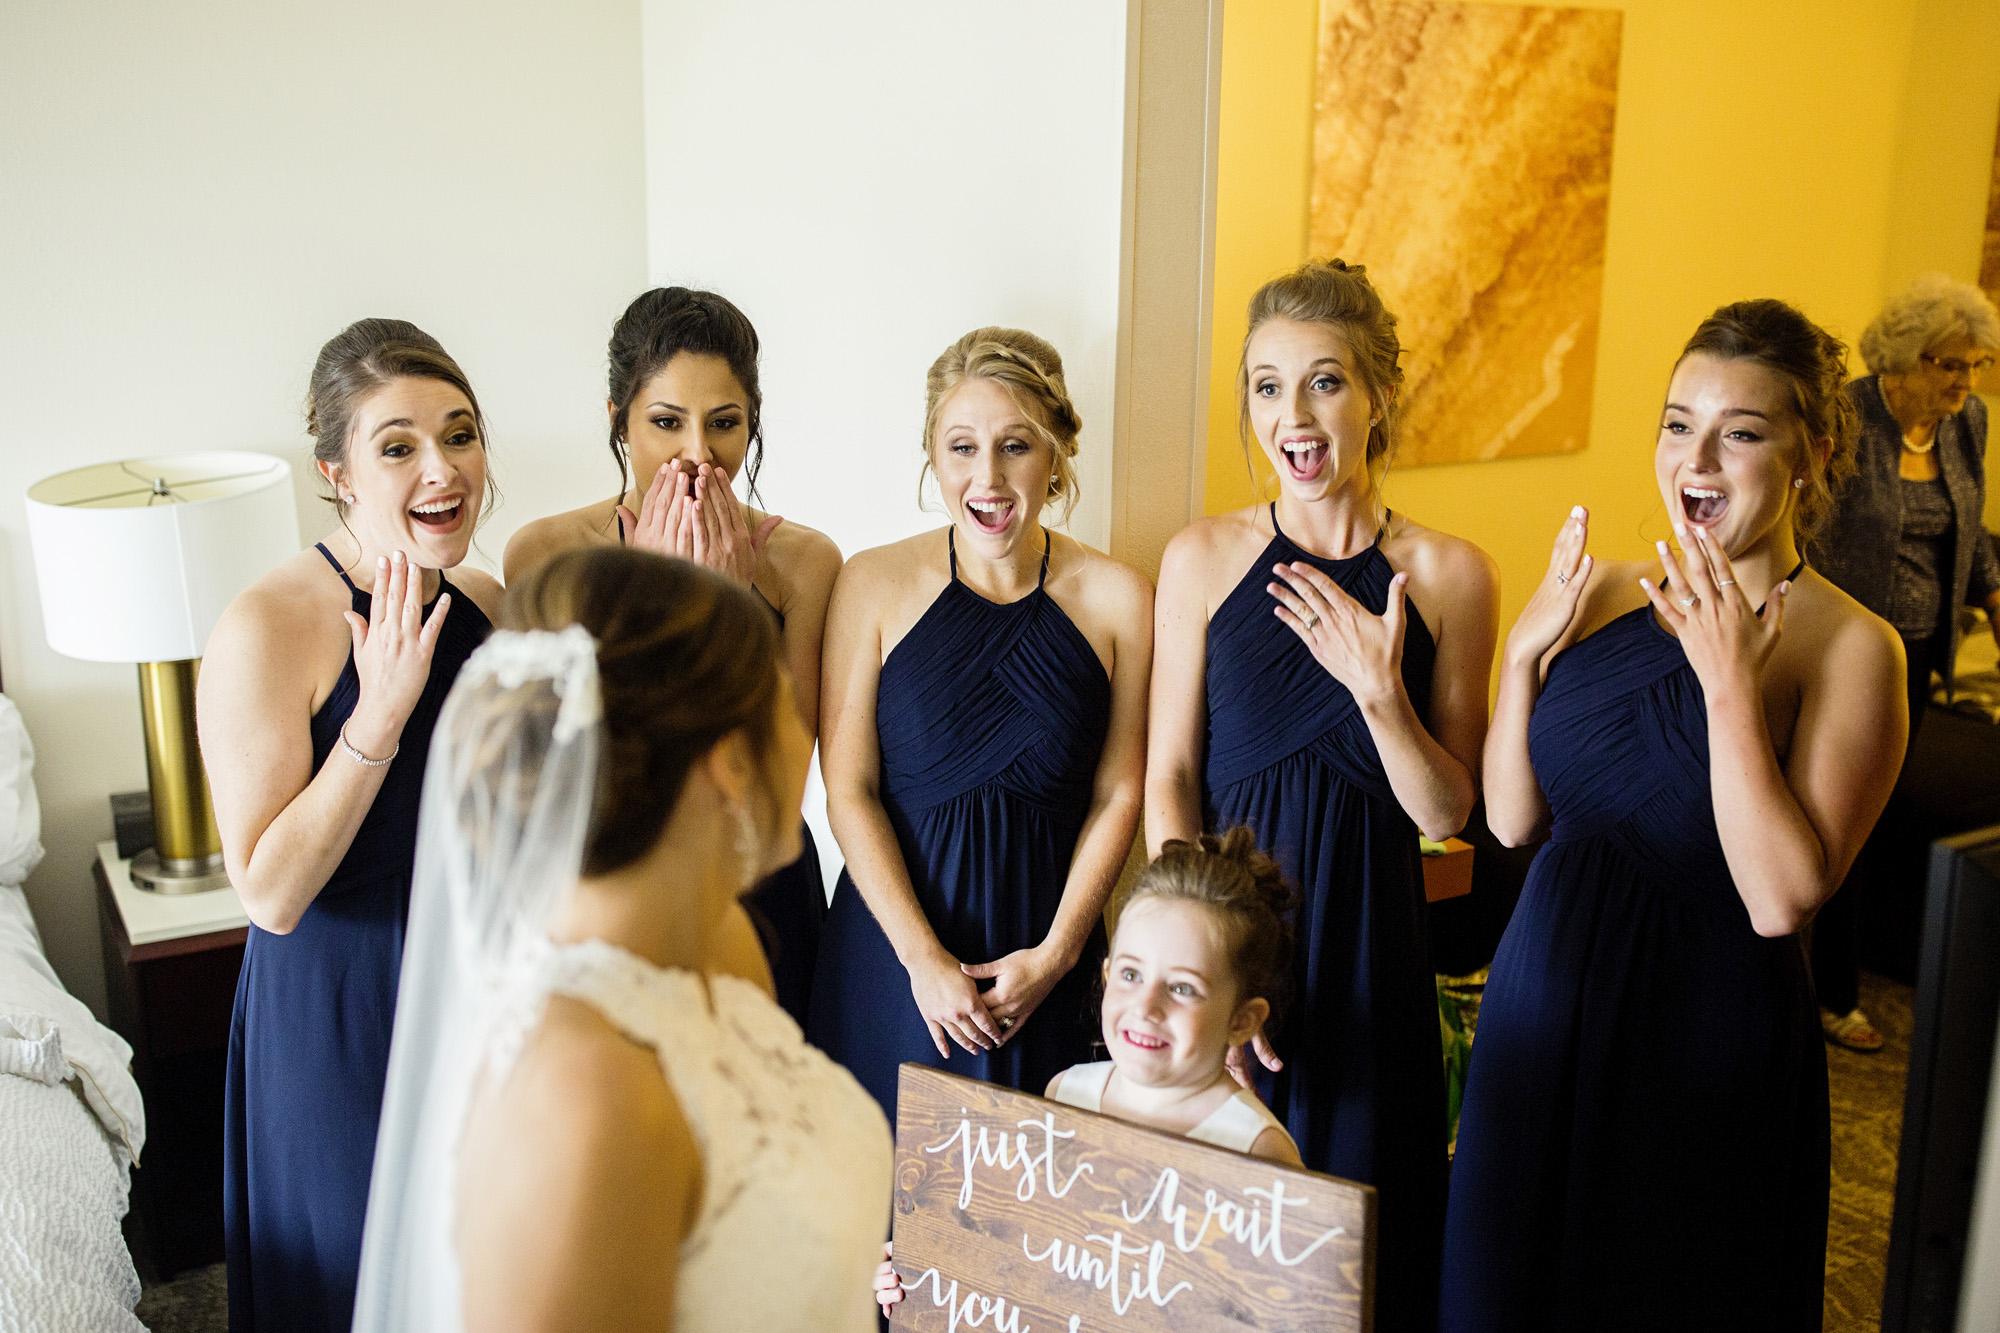 Seriously_Sabrina_Photography_Lexington_Kentucky_Round_Barn_Red_Mile_Stable_of_Memories_Wedding_Hart_24.jpg